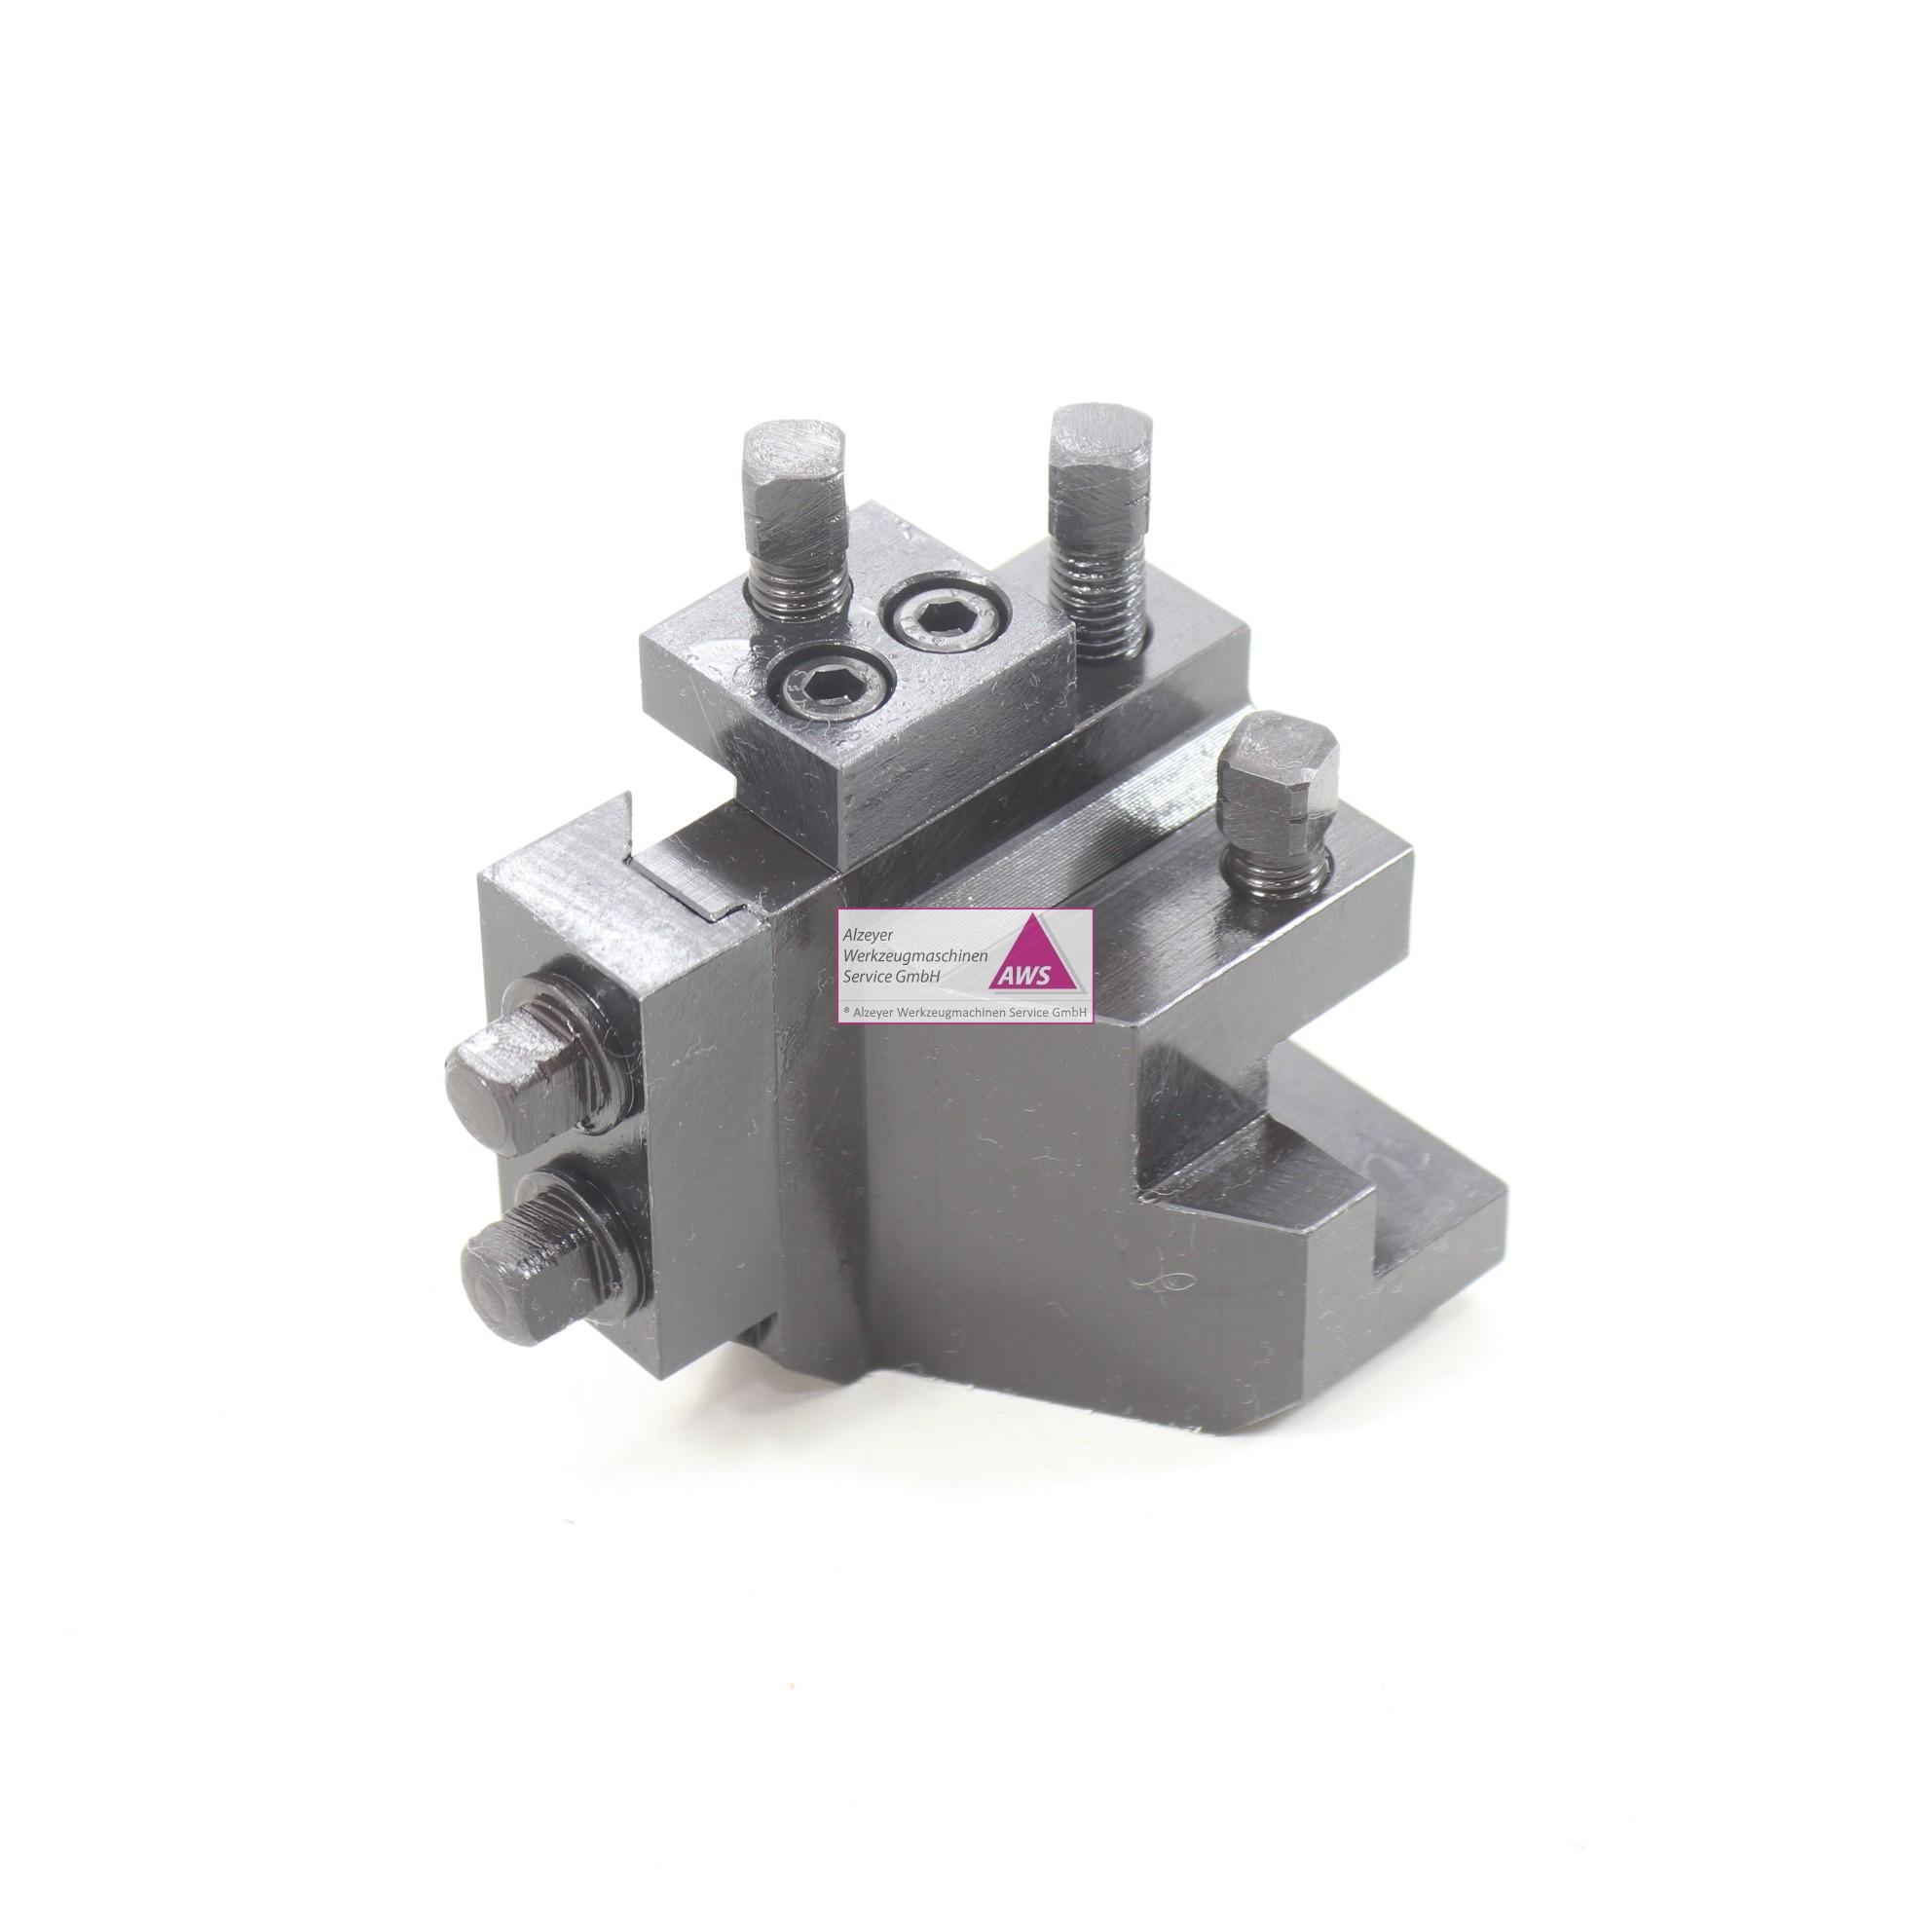 Werkzeughalter Kreuzschlitten Ergomat 16x16 / X1-Z1